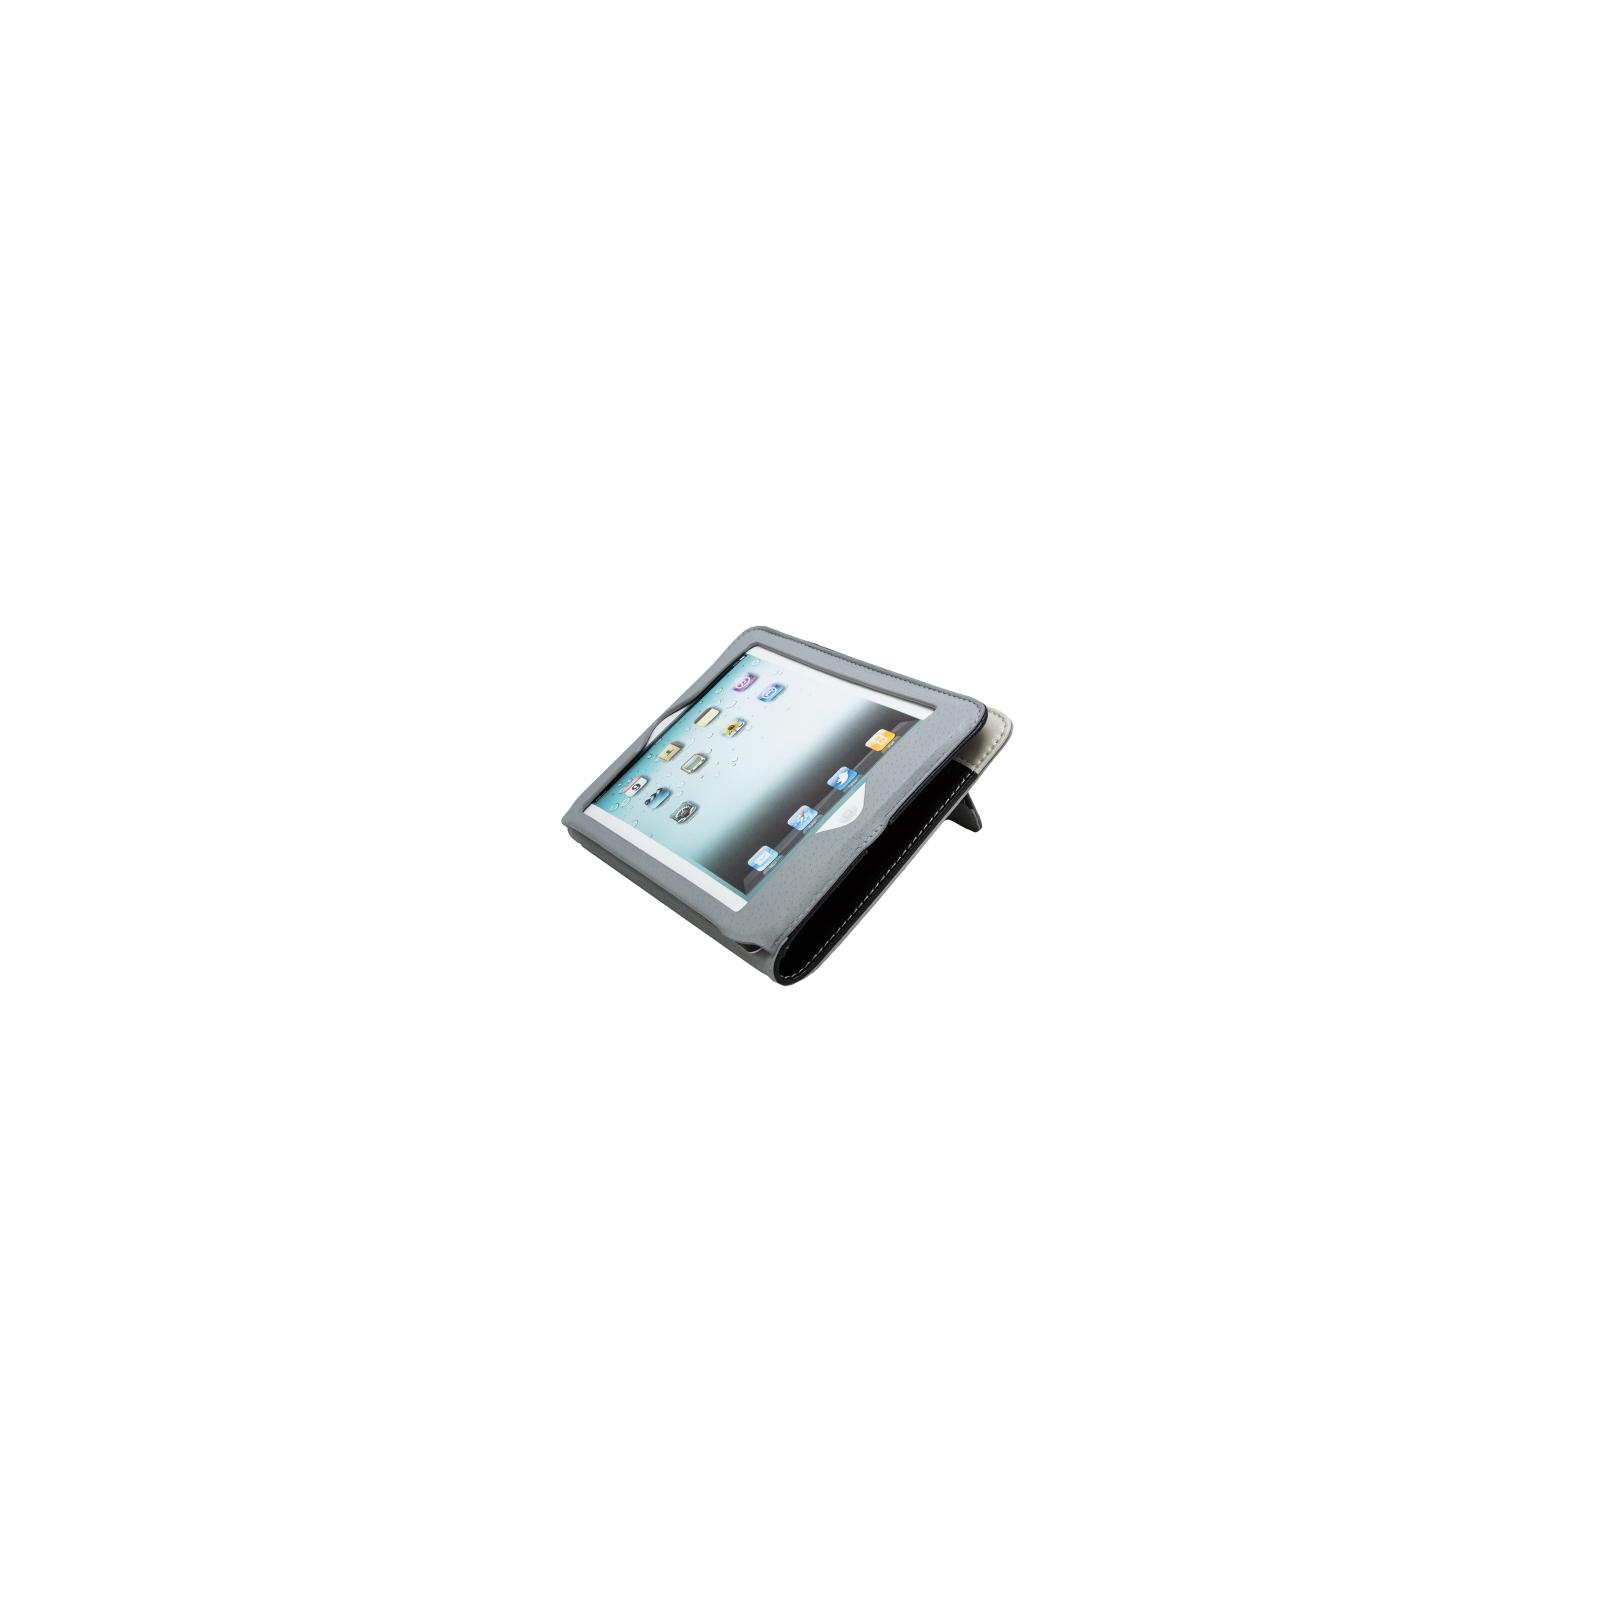 Чехол для планшета Drobak 7.9 Apple iPad mini /Comfort Style/Black (210247) изображение 2